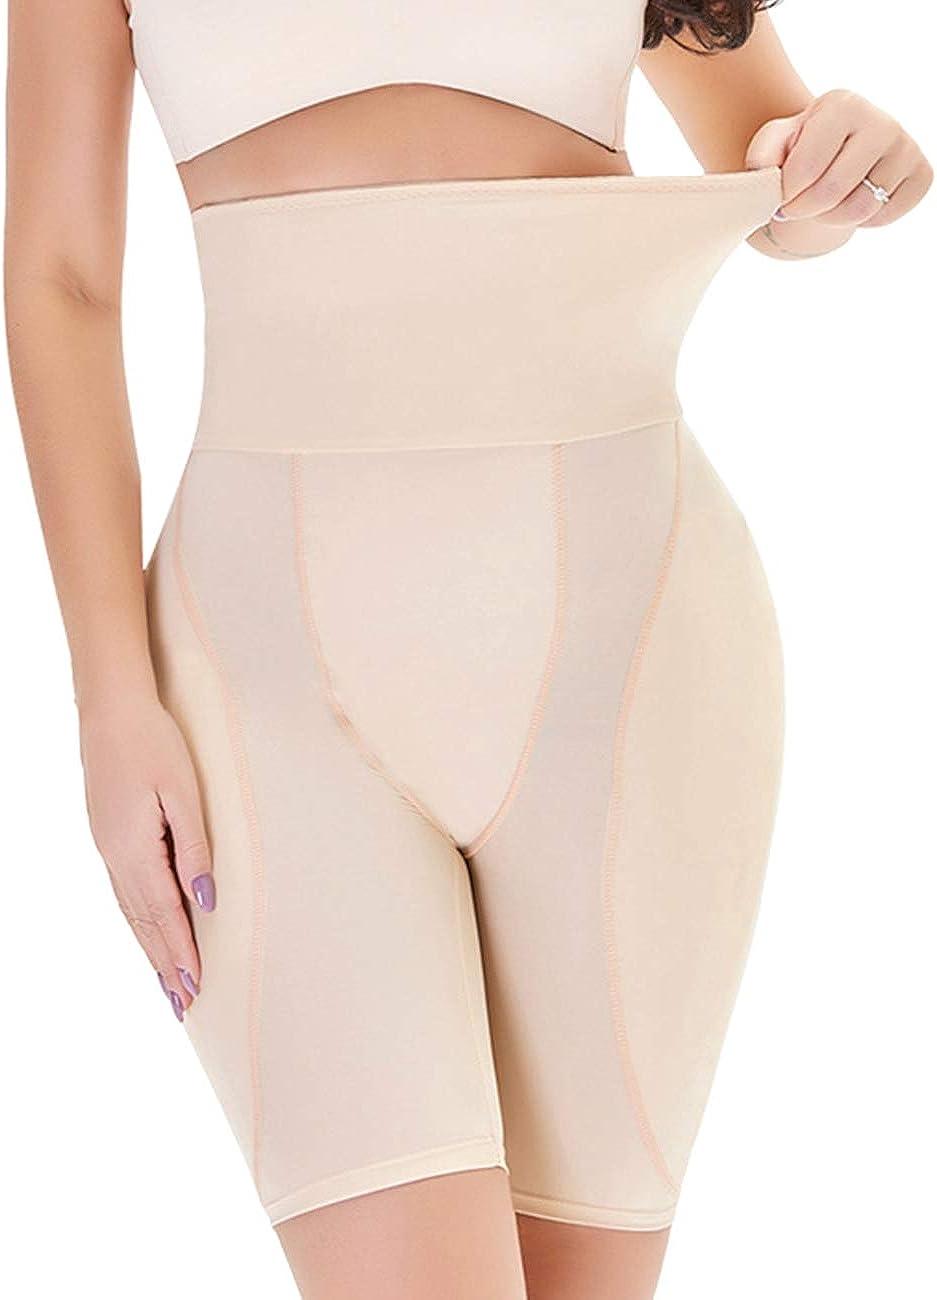 RIBIKA Women's High Ranking TOP18 Waist Tummy Control Limited Special Price Padded Enhan Panties Hip